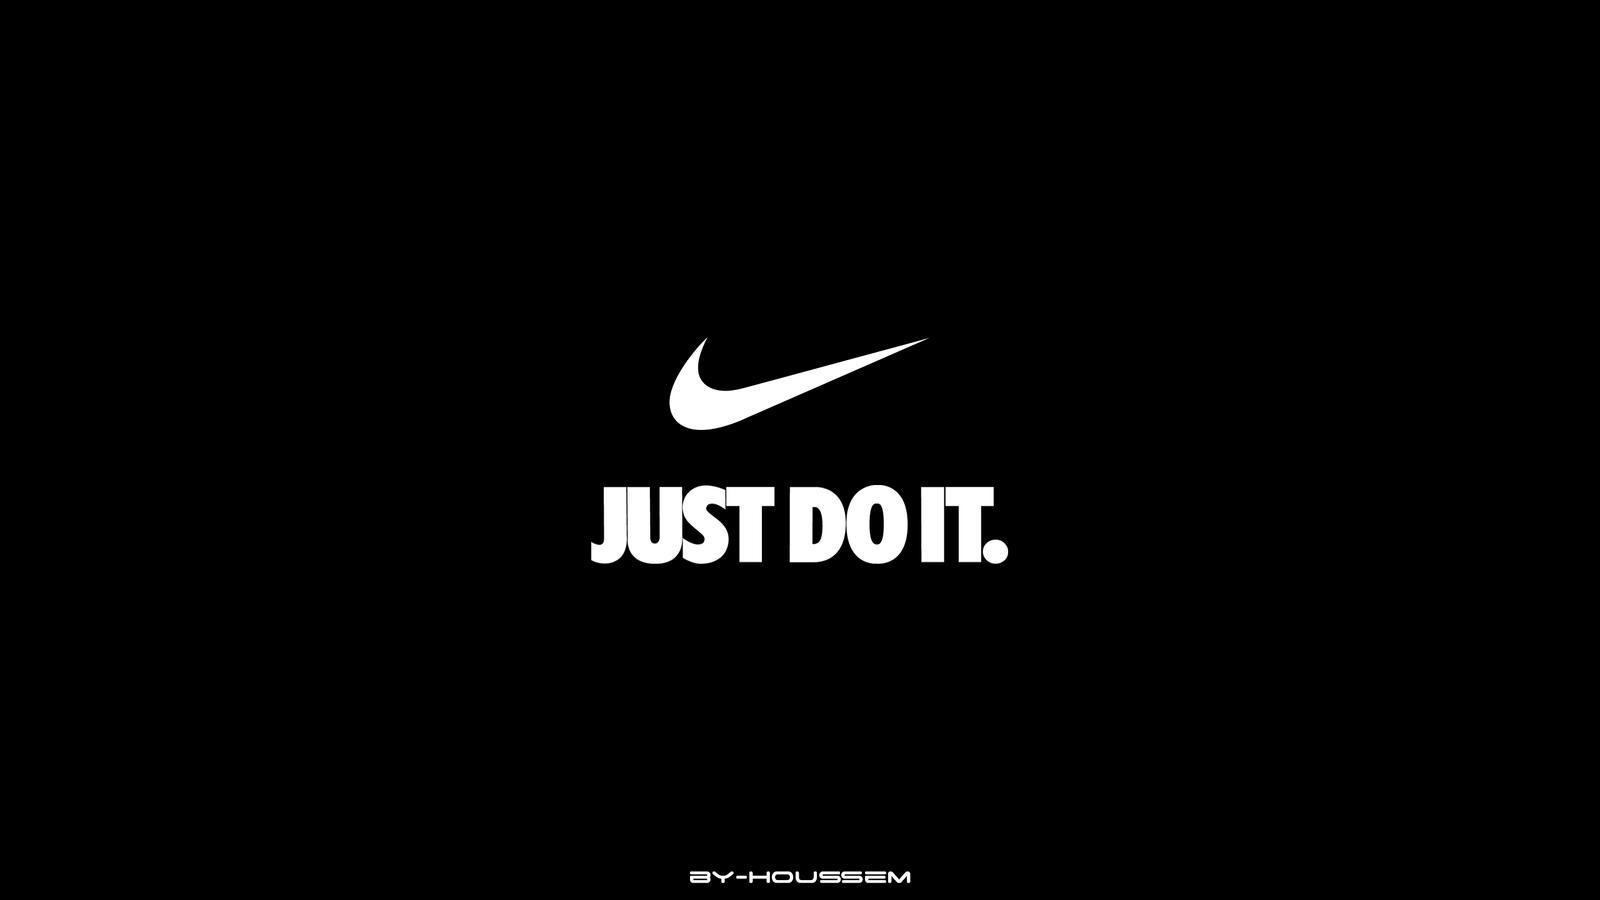 Nike Wallpaper Just Do It Football Nike wallpaper just do itNike Just Do It Football